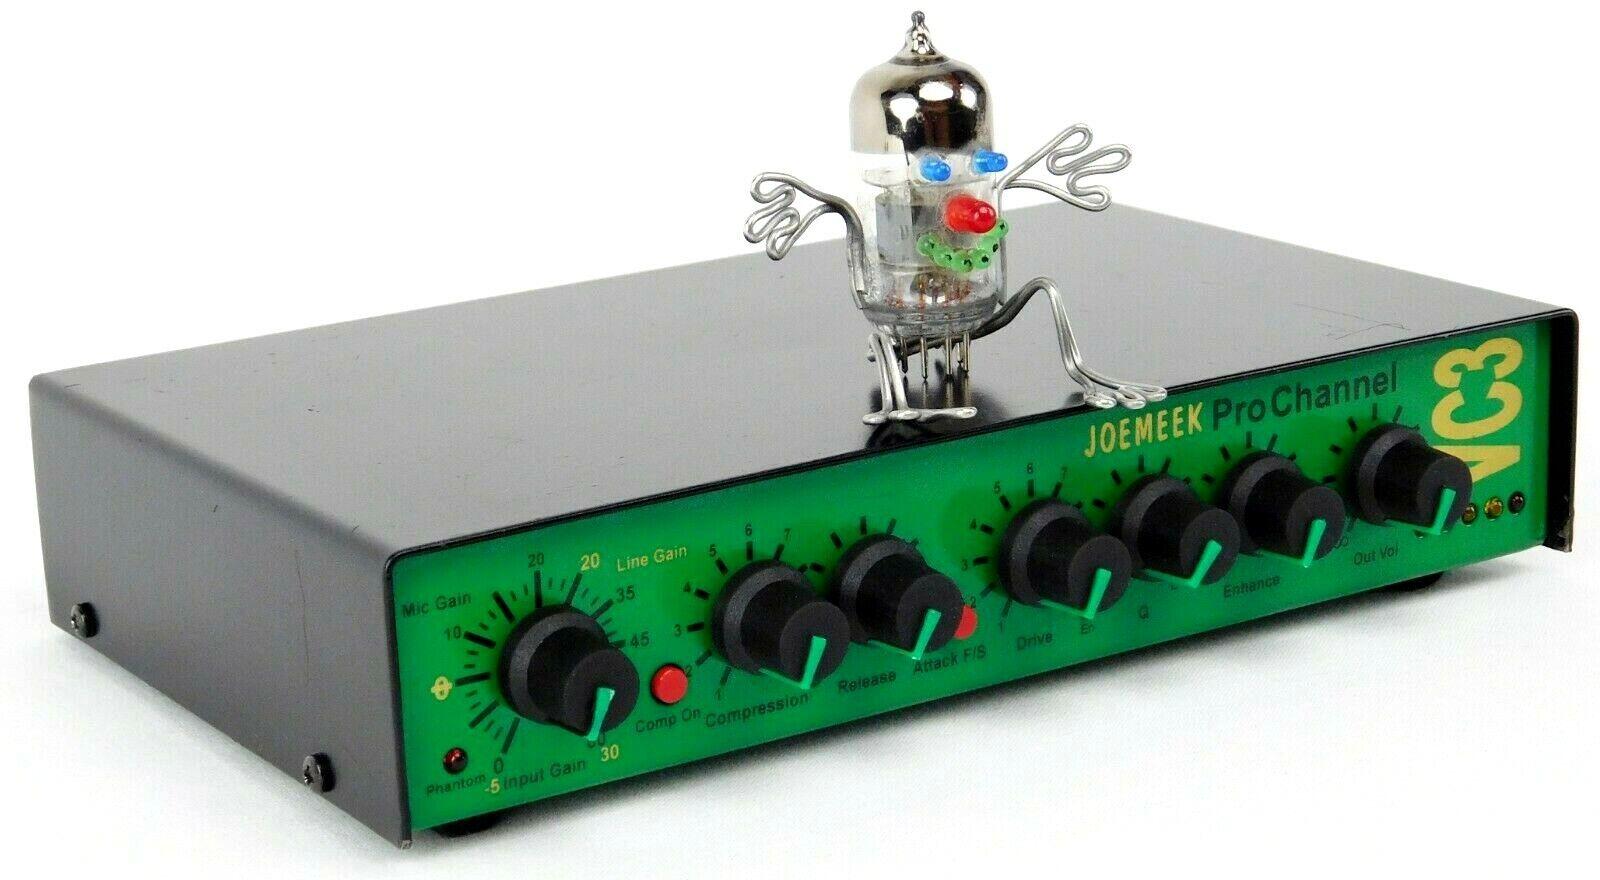 JoeMeek VC3 Gold Pro Channel Mic Preamp Enhancer TFPRO Guter Zustand Garantie